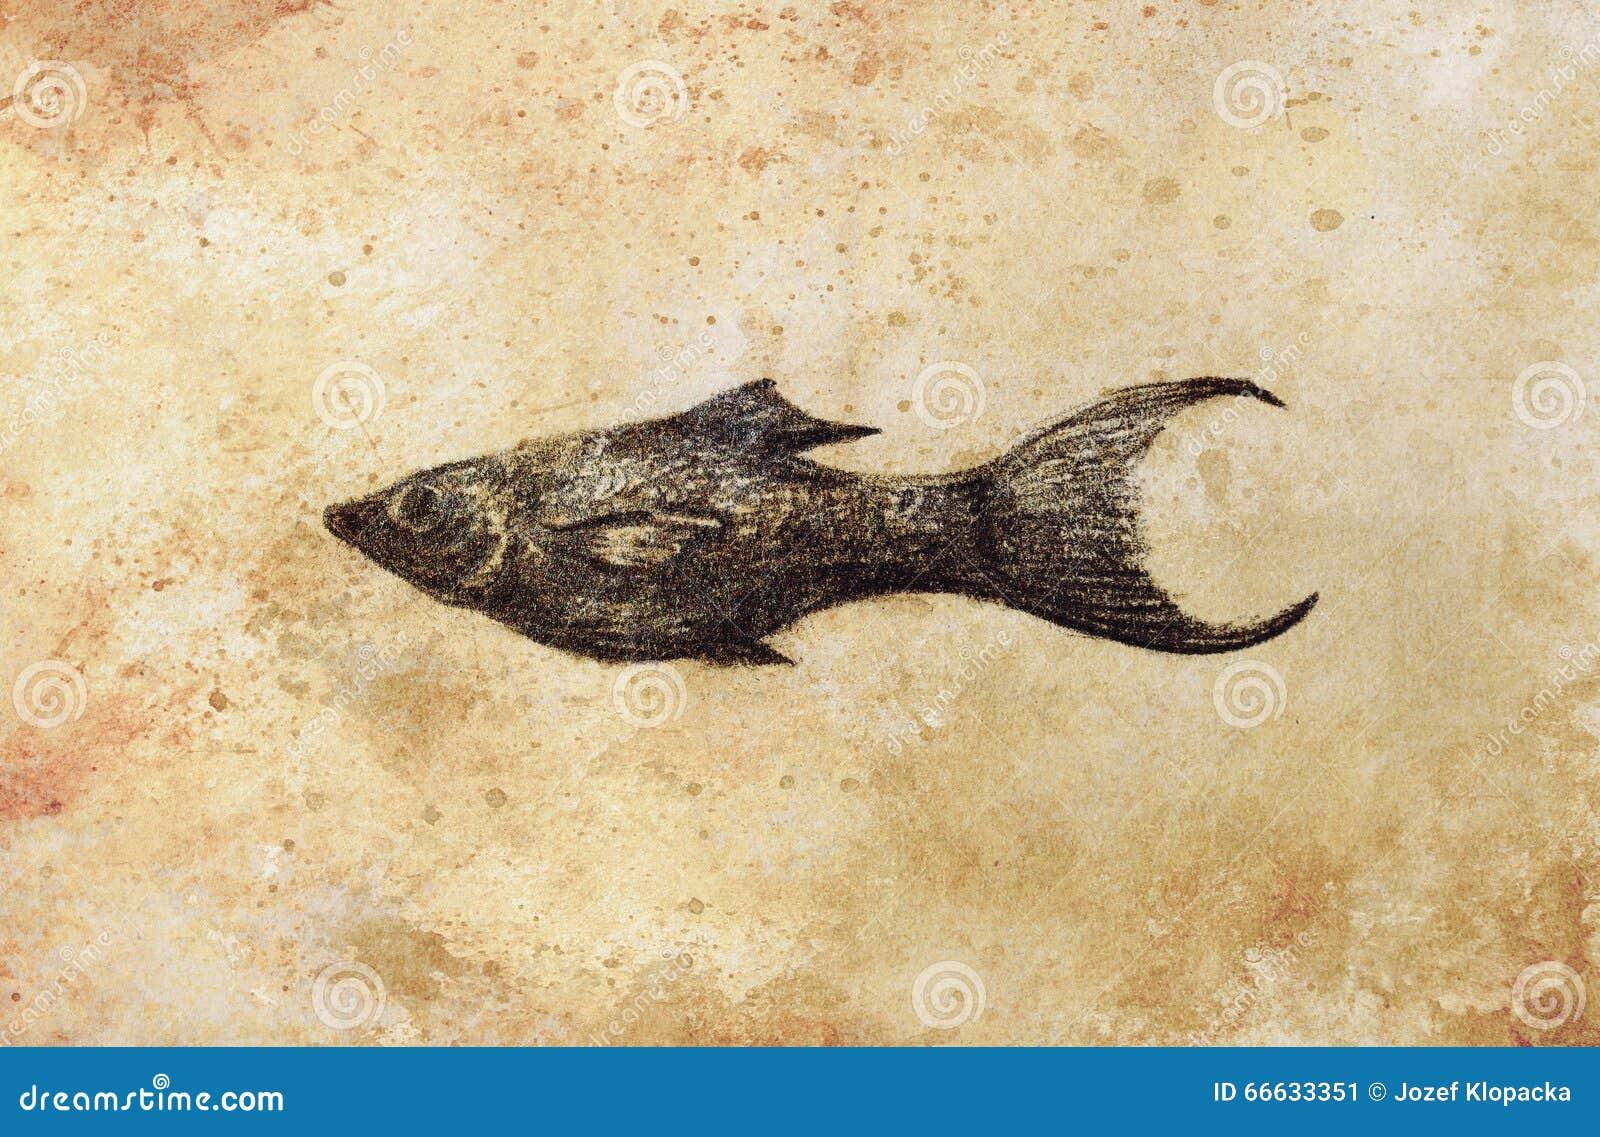 The pencil drawing aquarium fish on old paper stock illustration